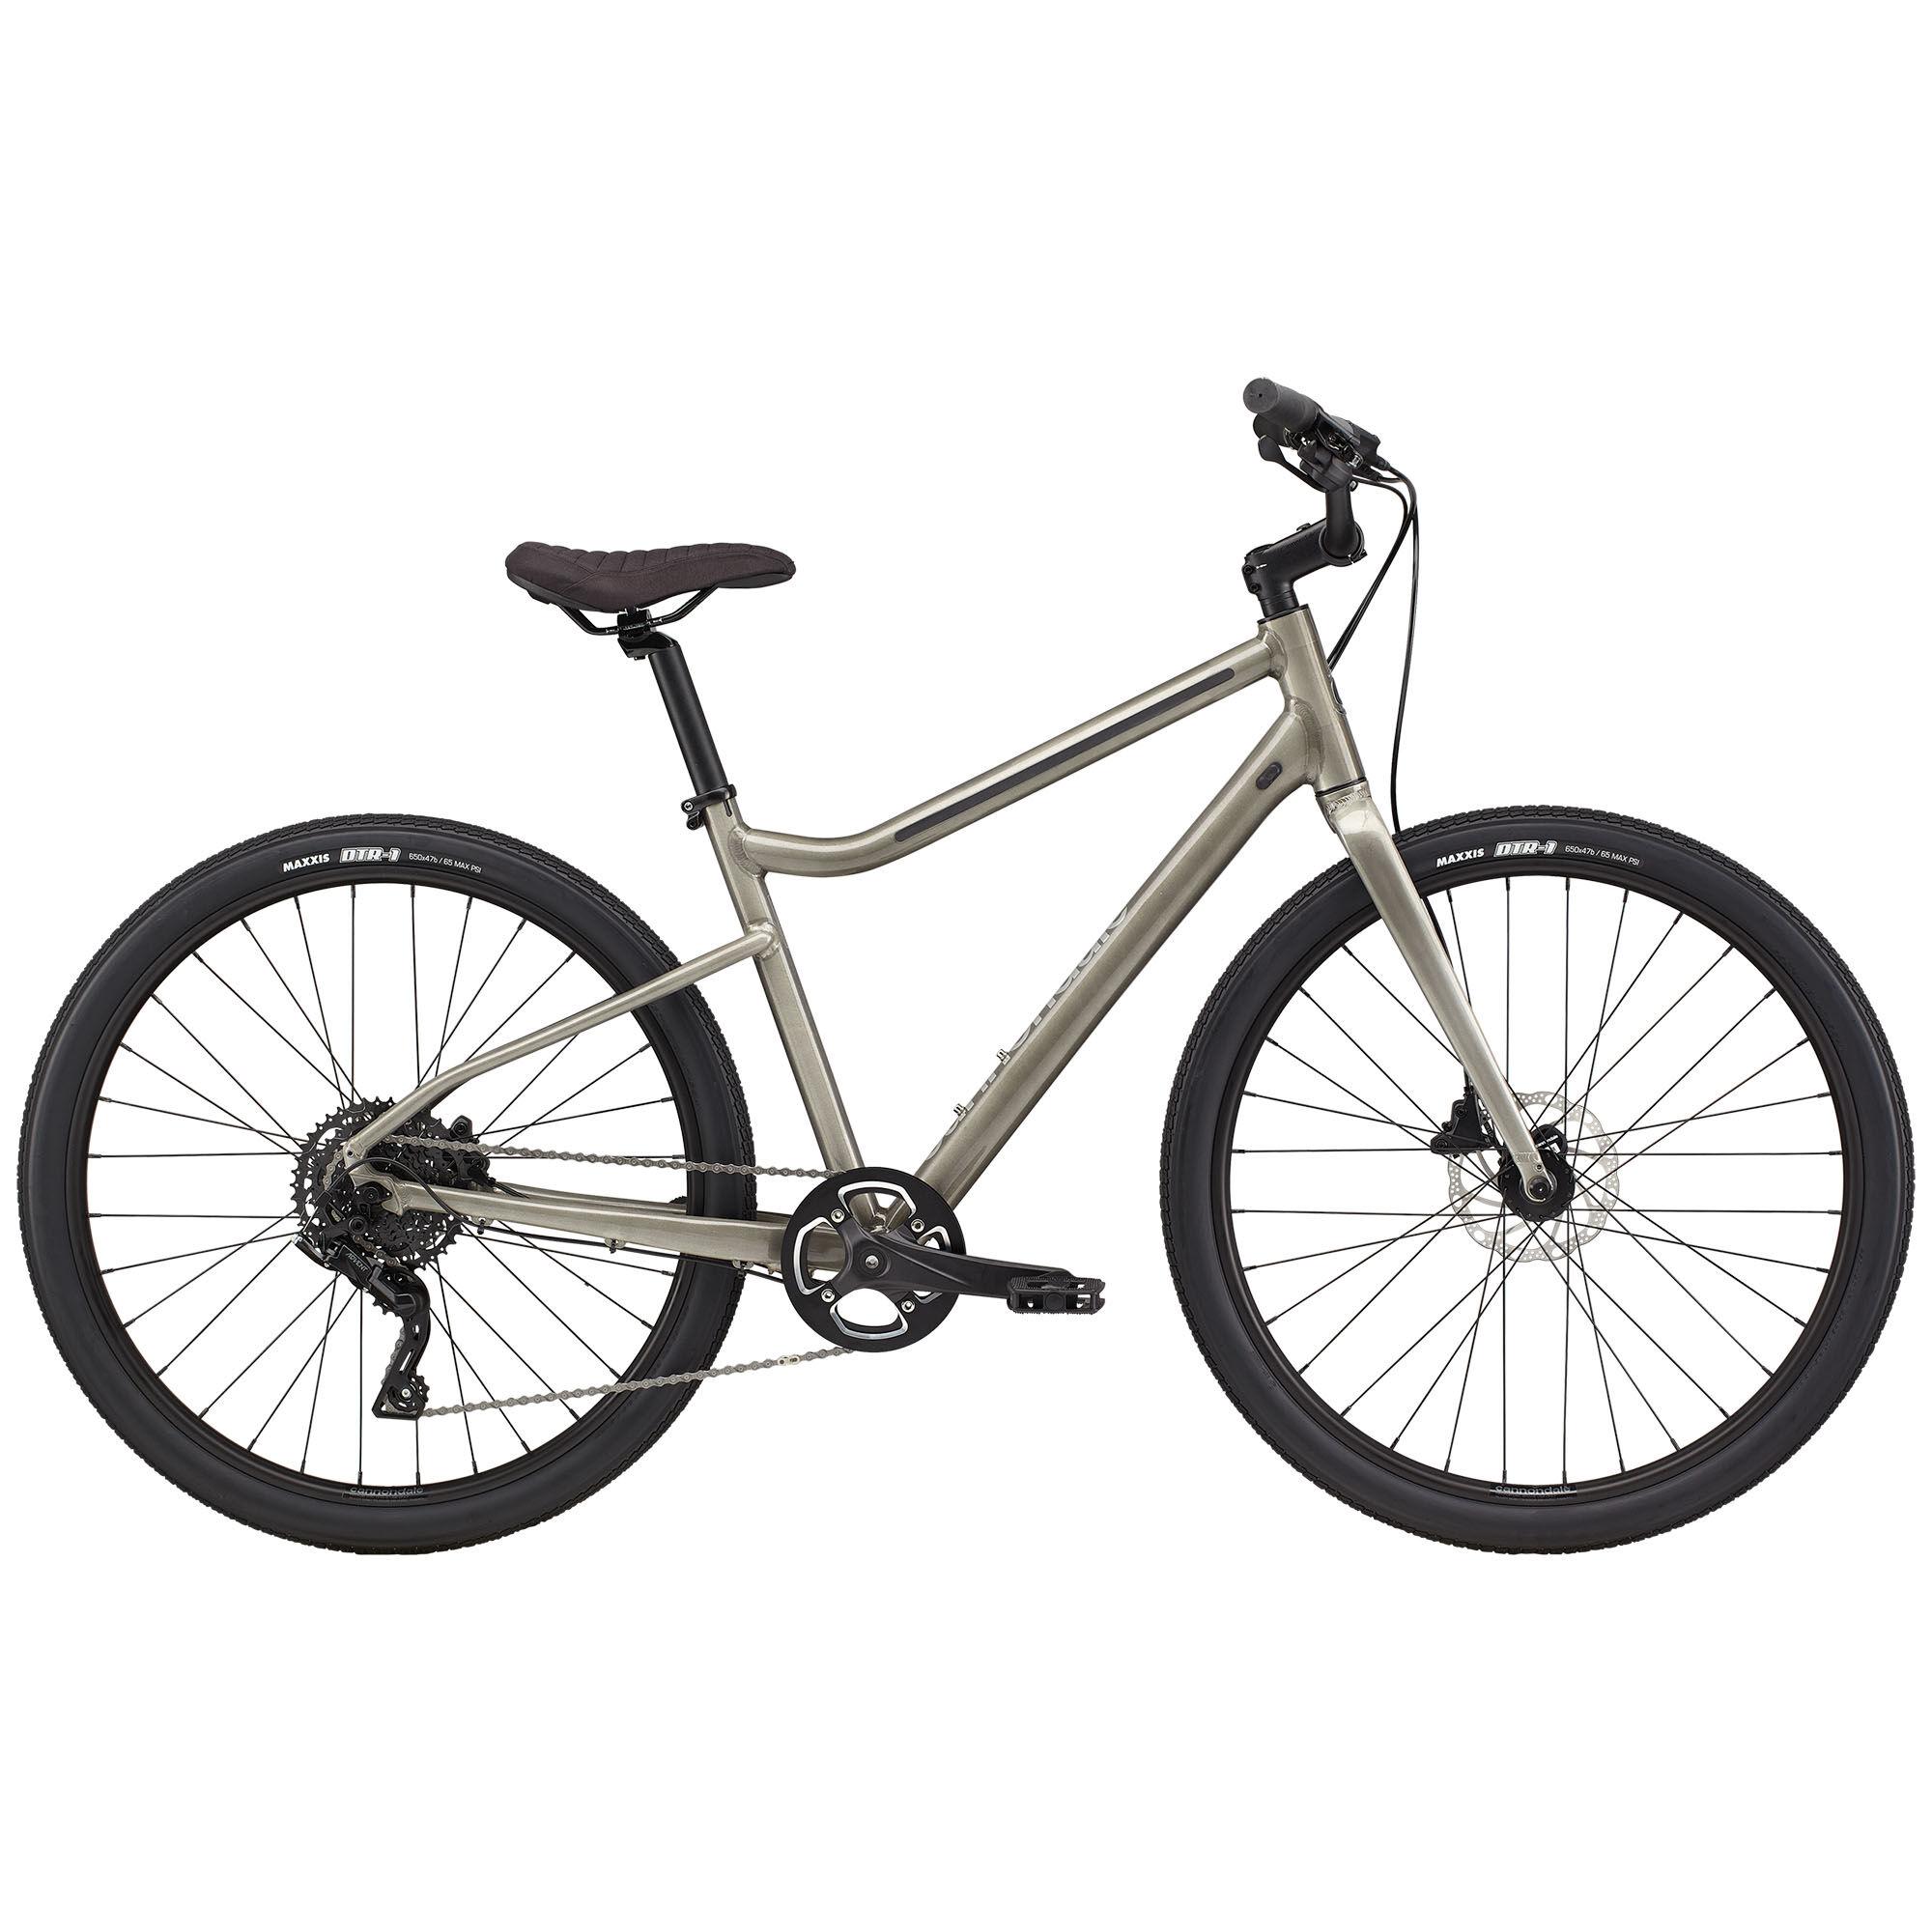 Cannondale Treadwell 2 LTD Urban Bike '21  - Raw - Size: Medium